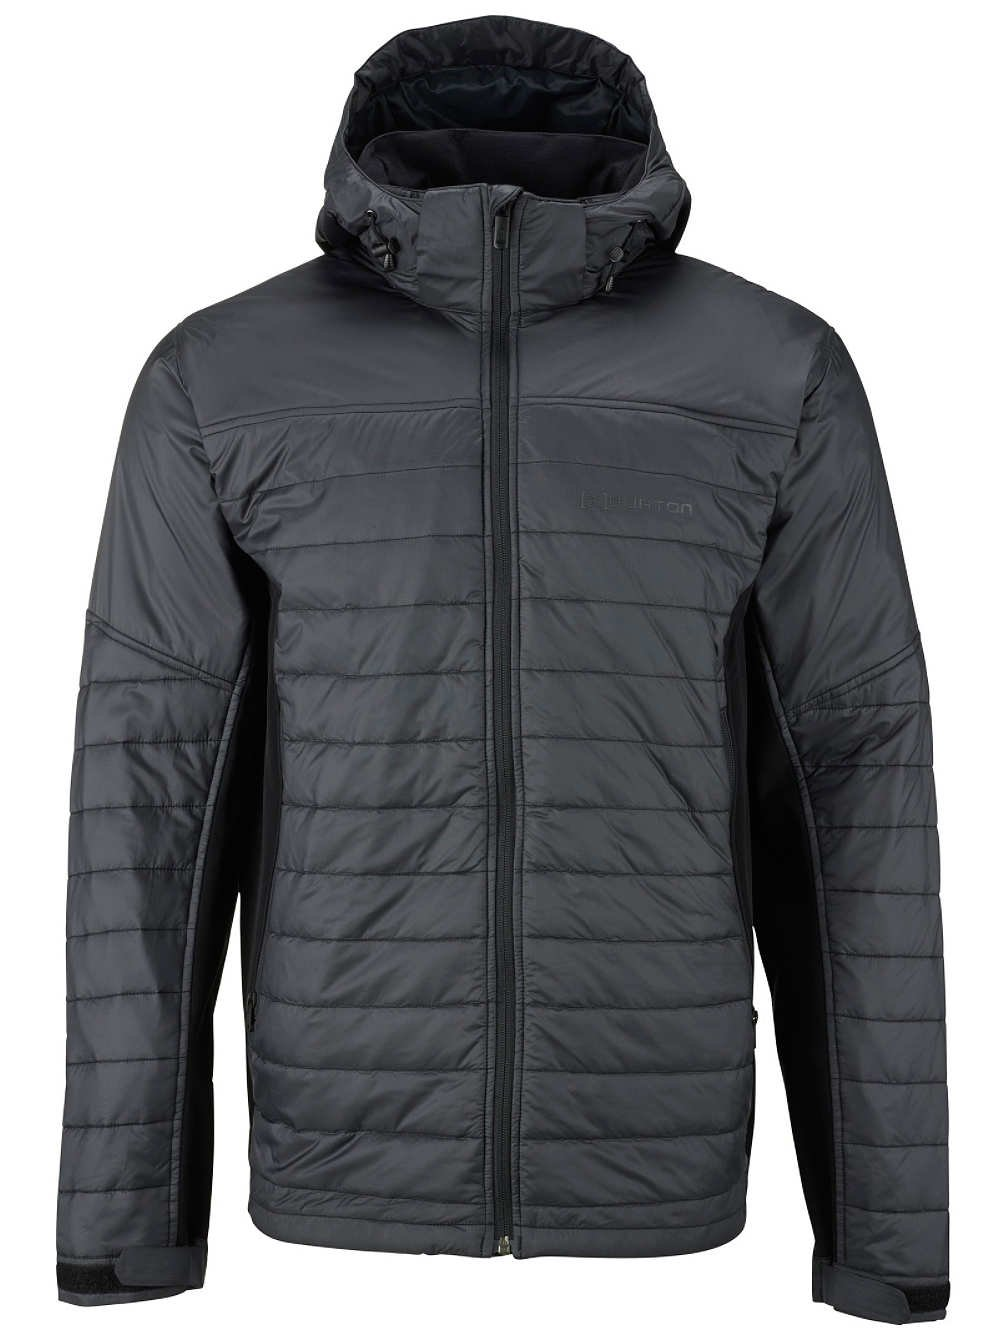 Burton Herren Snowboardjacke M AK Helium ins Jacket bestellen